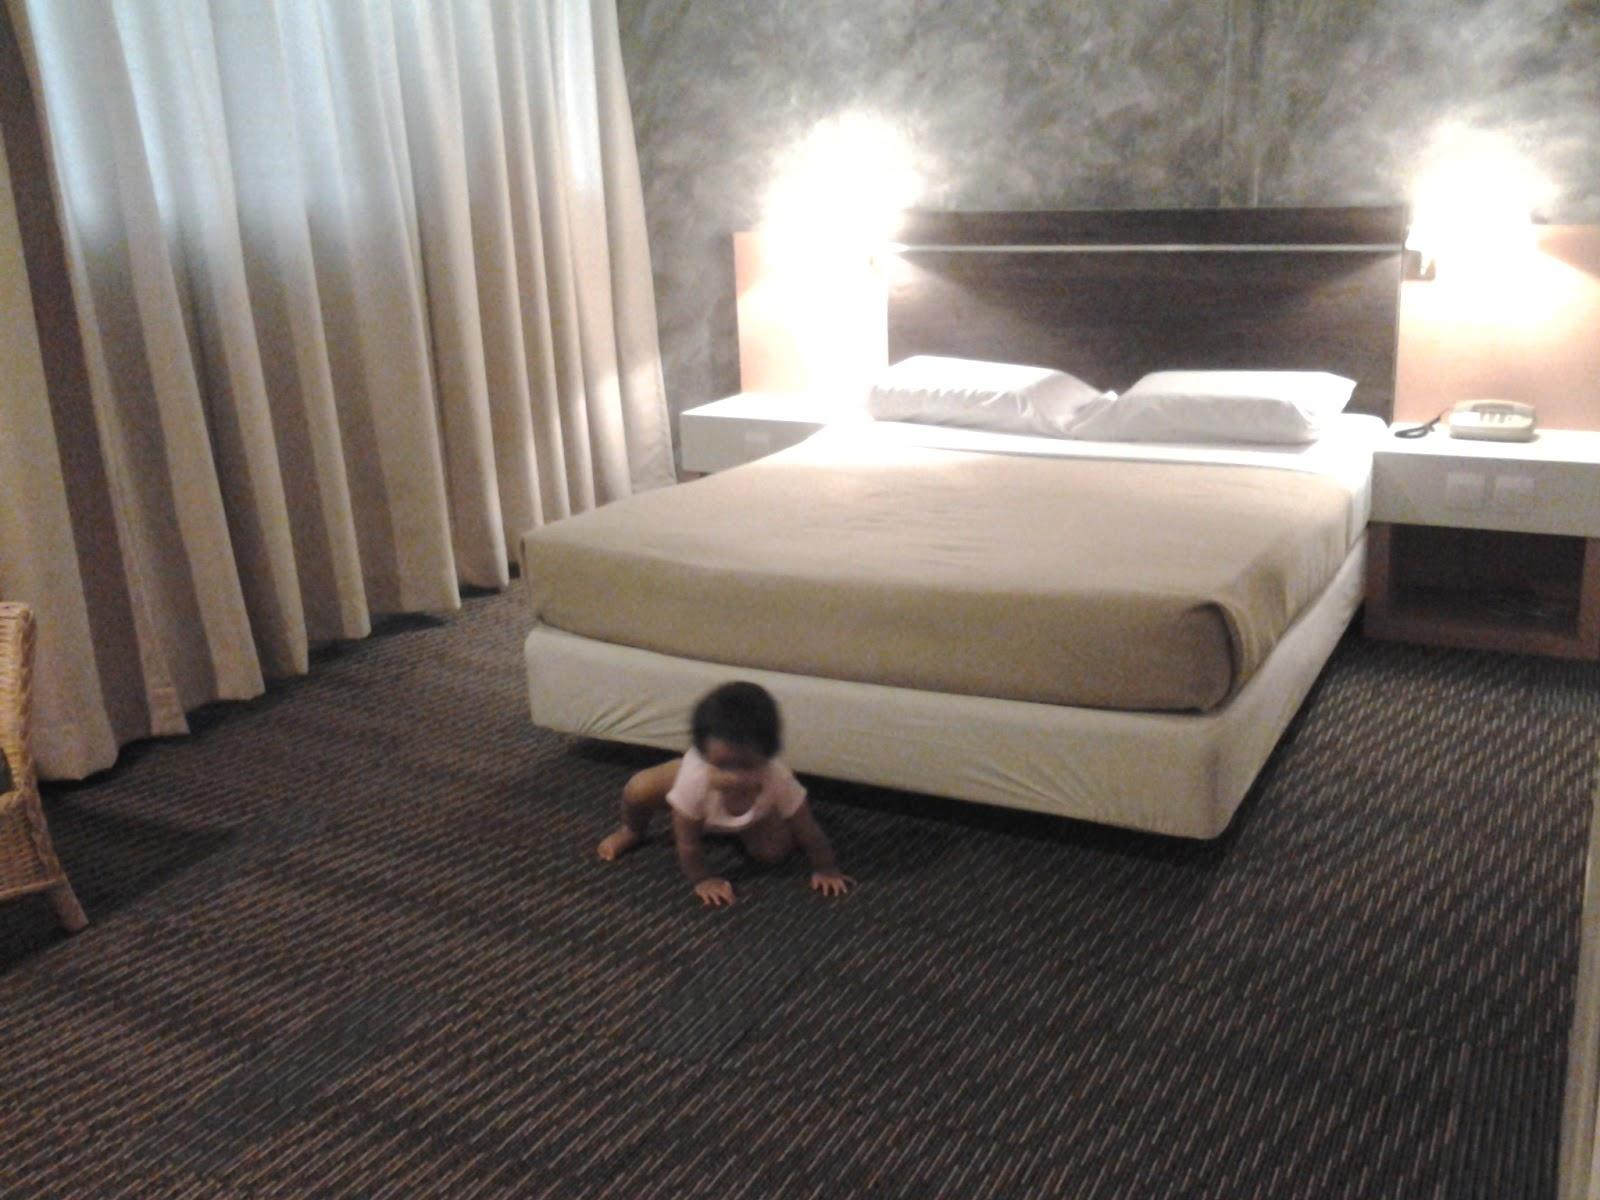 baby bath tub yang bagus merek tepung beras untuk bayi yang bagus forum infobunda little red. Black Bedroom Furniture Sets. Home Design Ideas